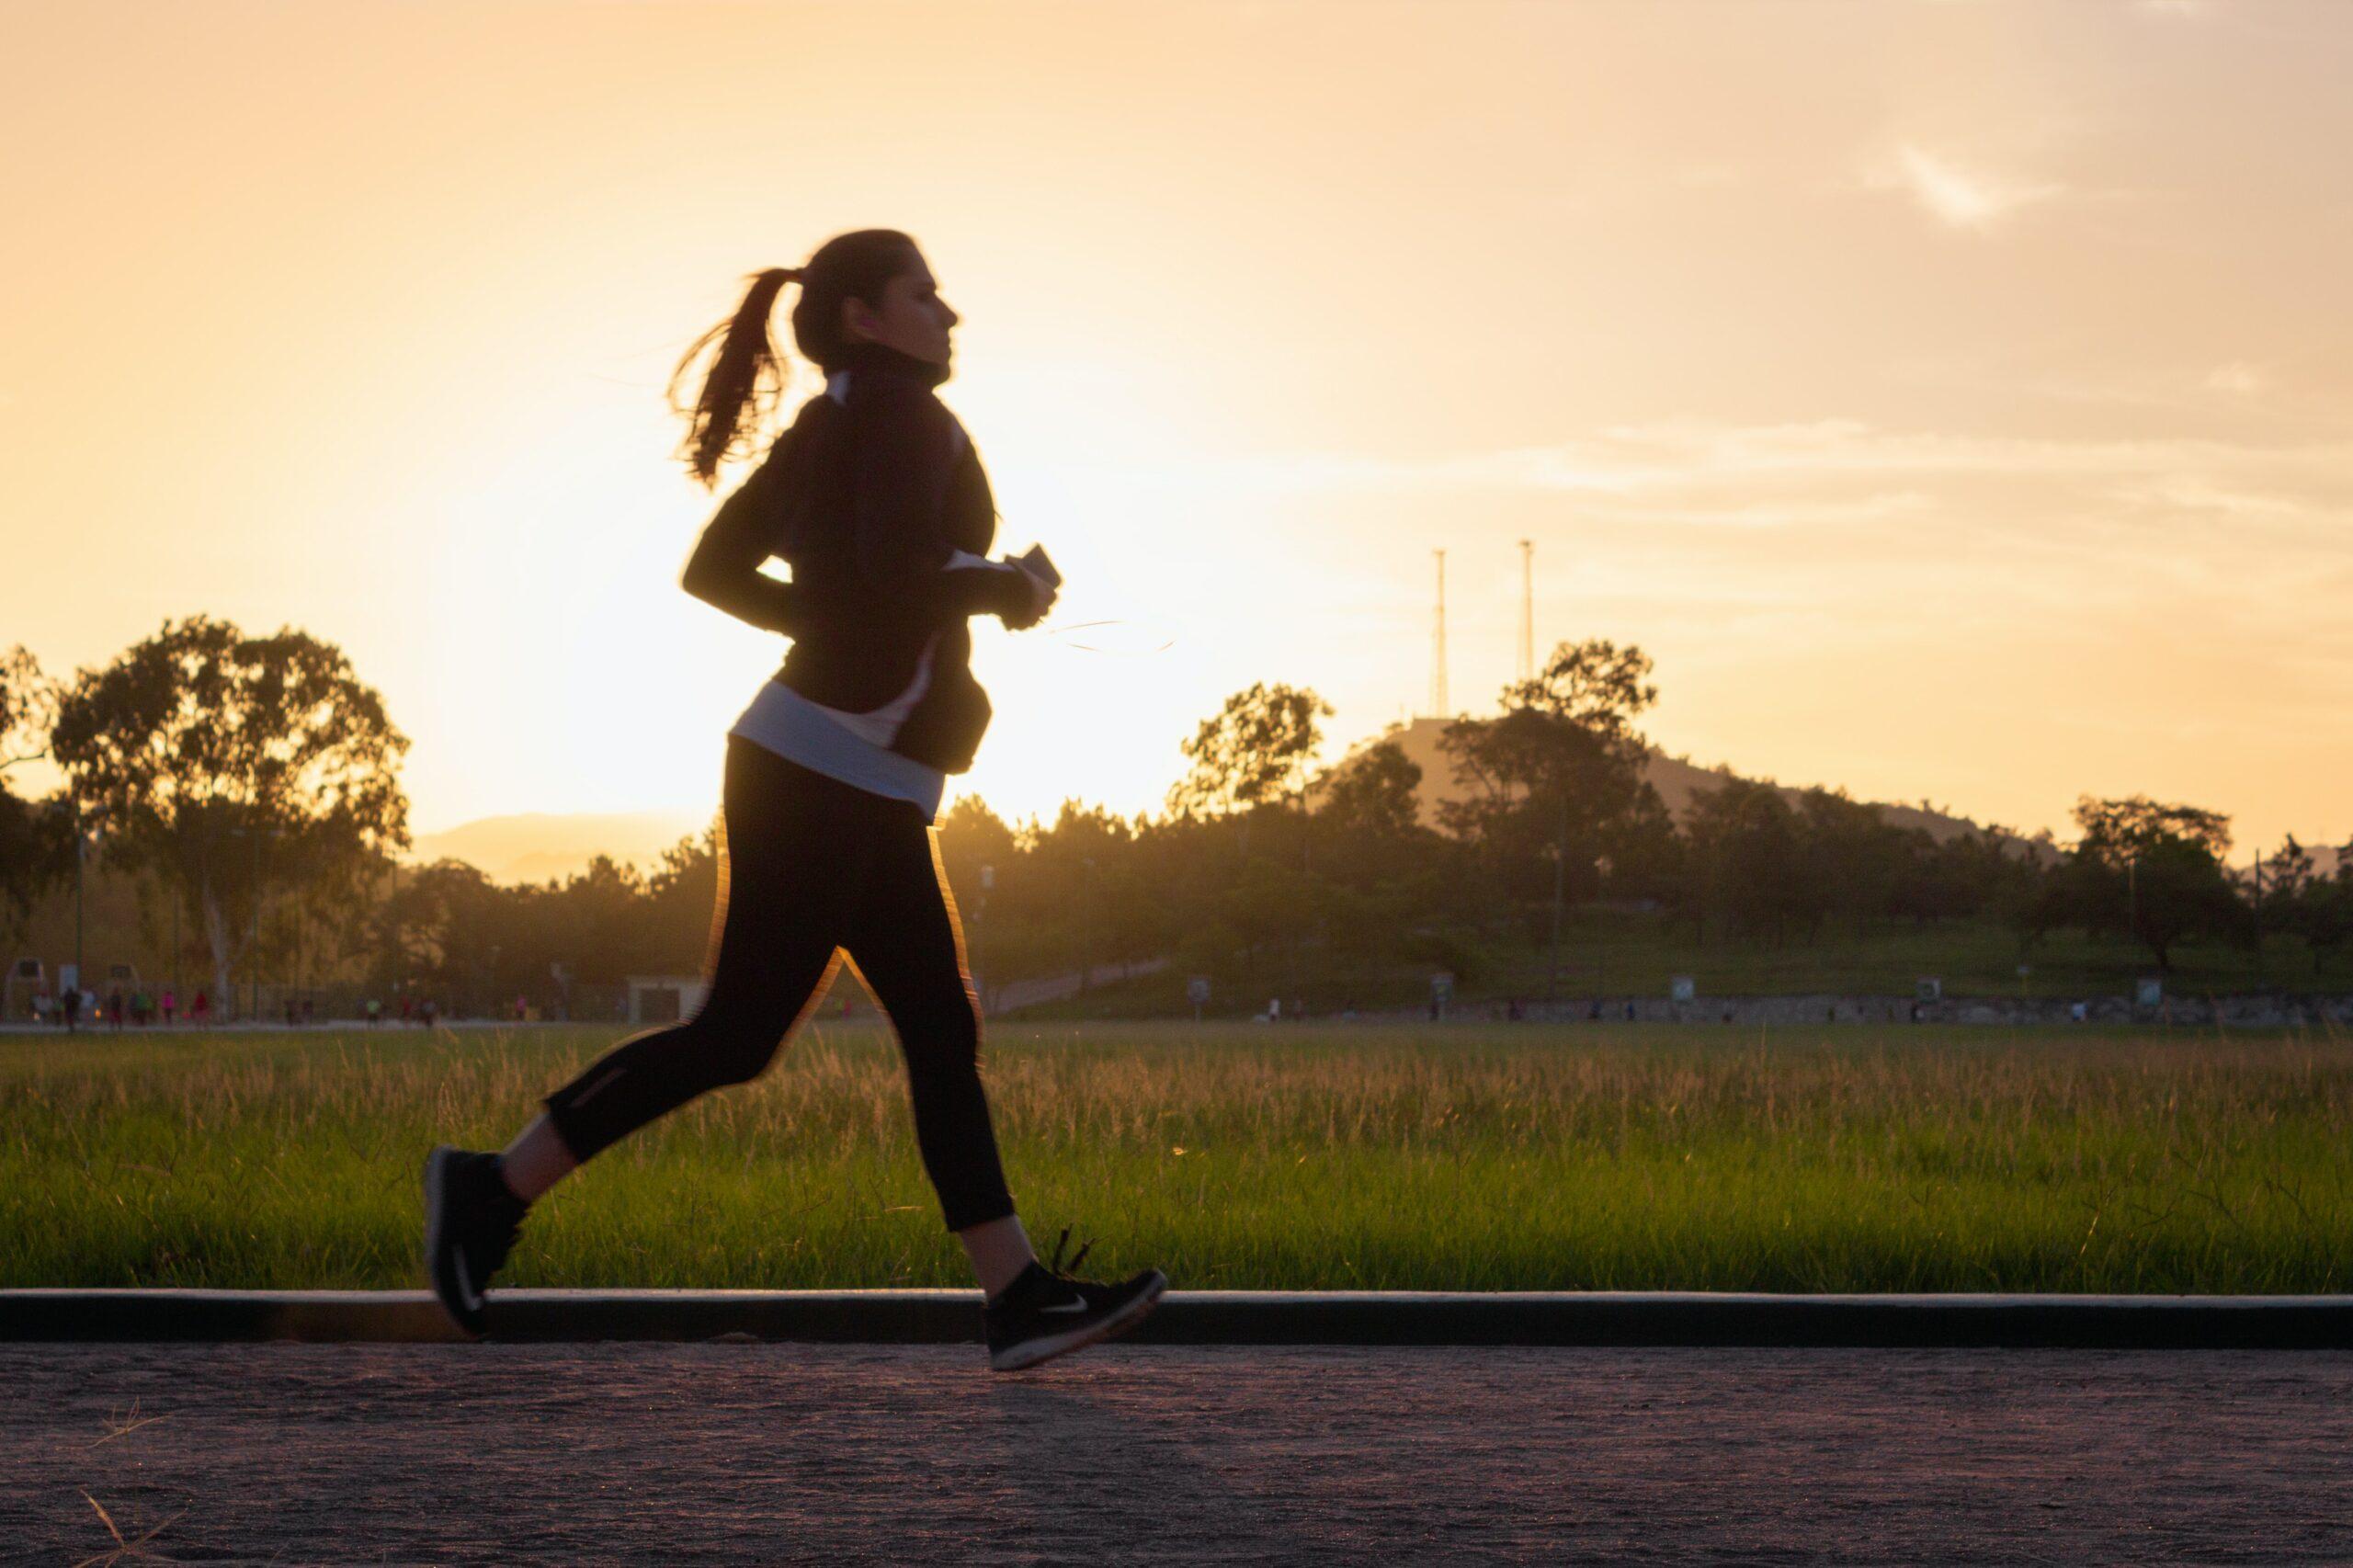 A woman jogging along a sunset